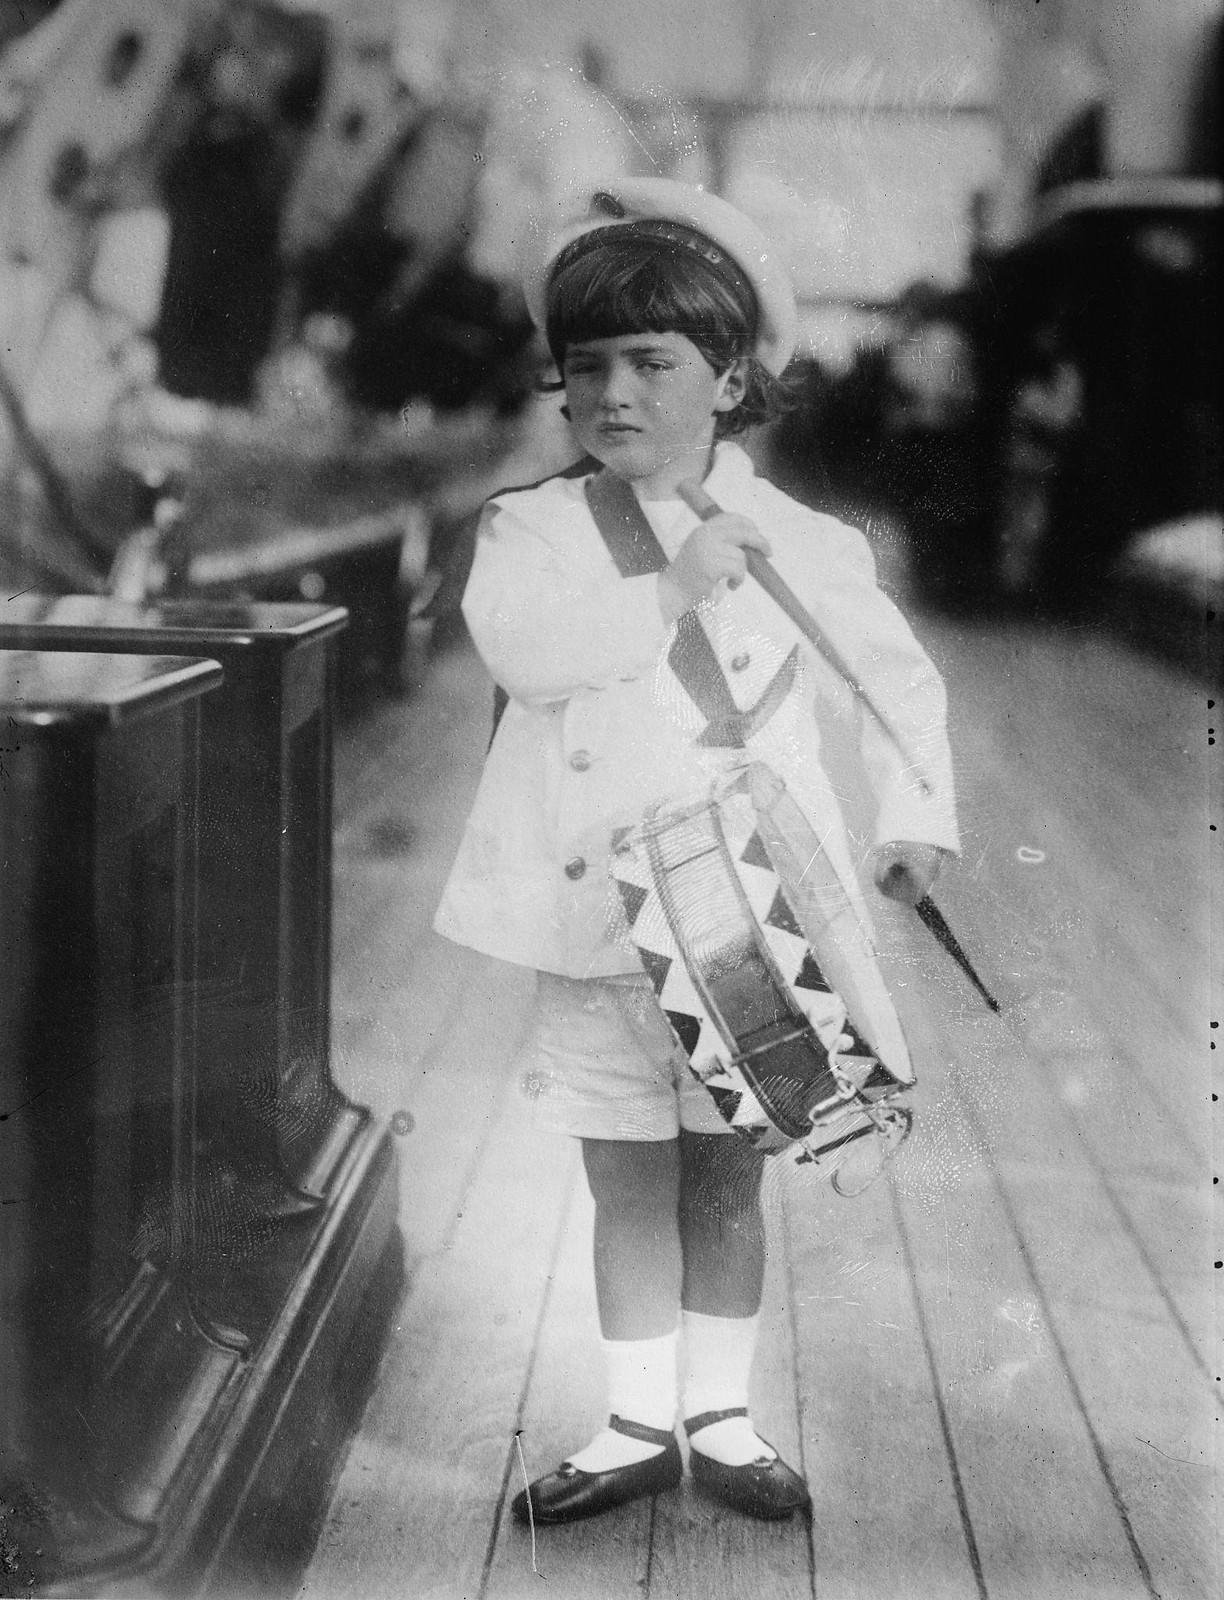 1909. Цесаревич Алексей Николаевич с барабаном на Штандарте